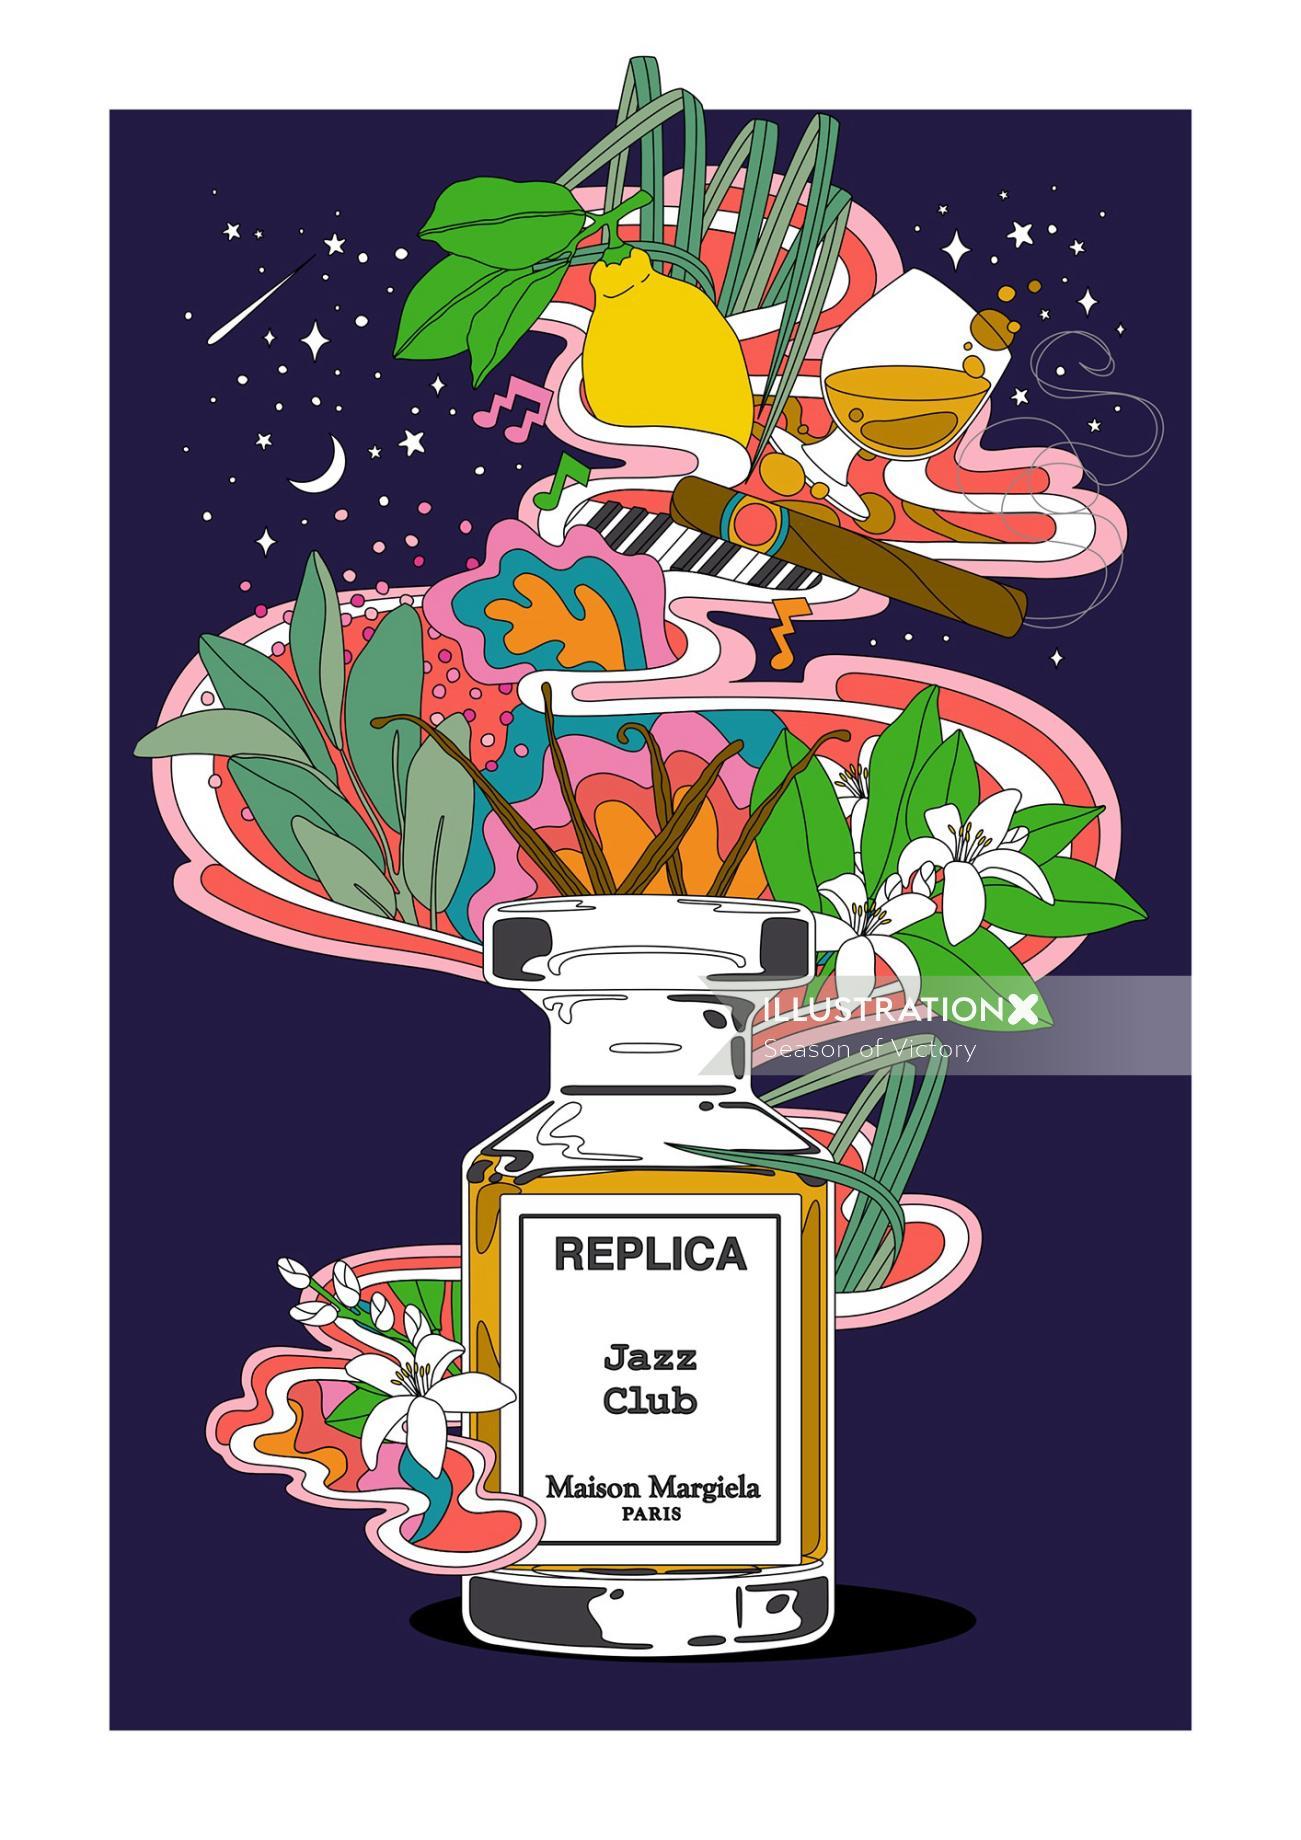 parfum, cologne, ingredients, advert, poster, poster art, poster illustration,packaging, christmas,